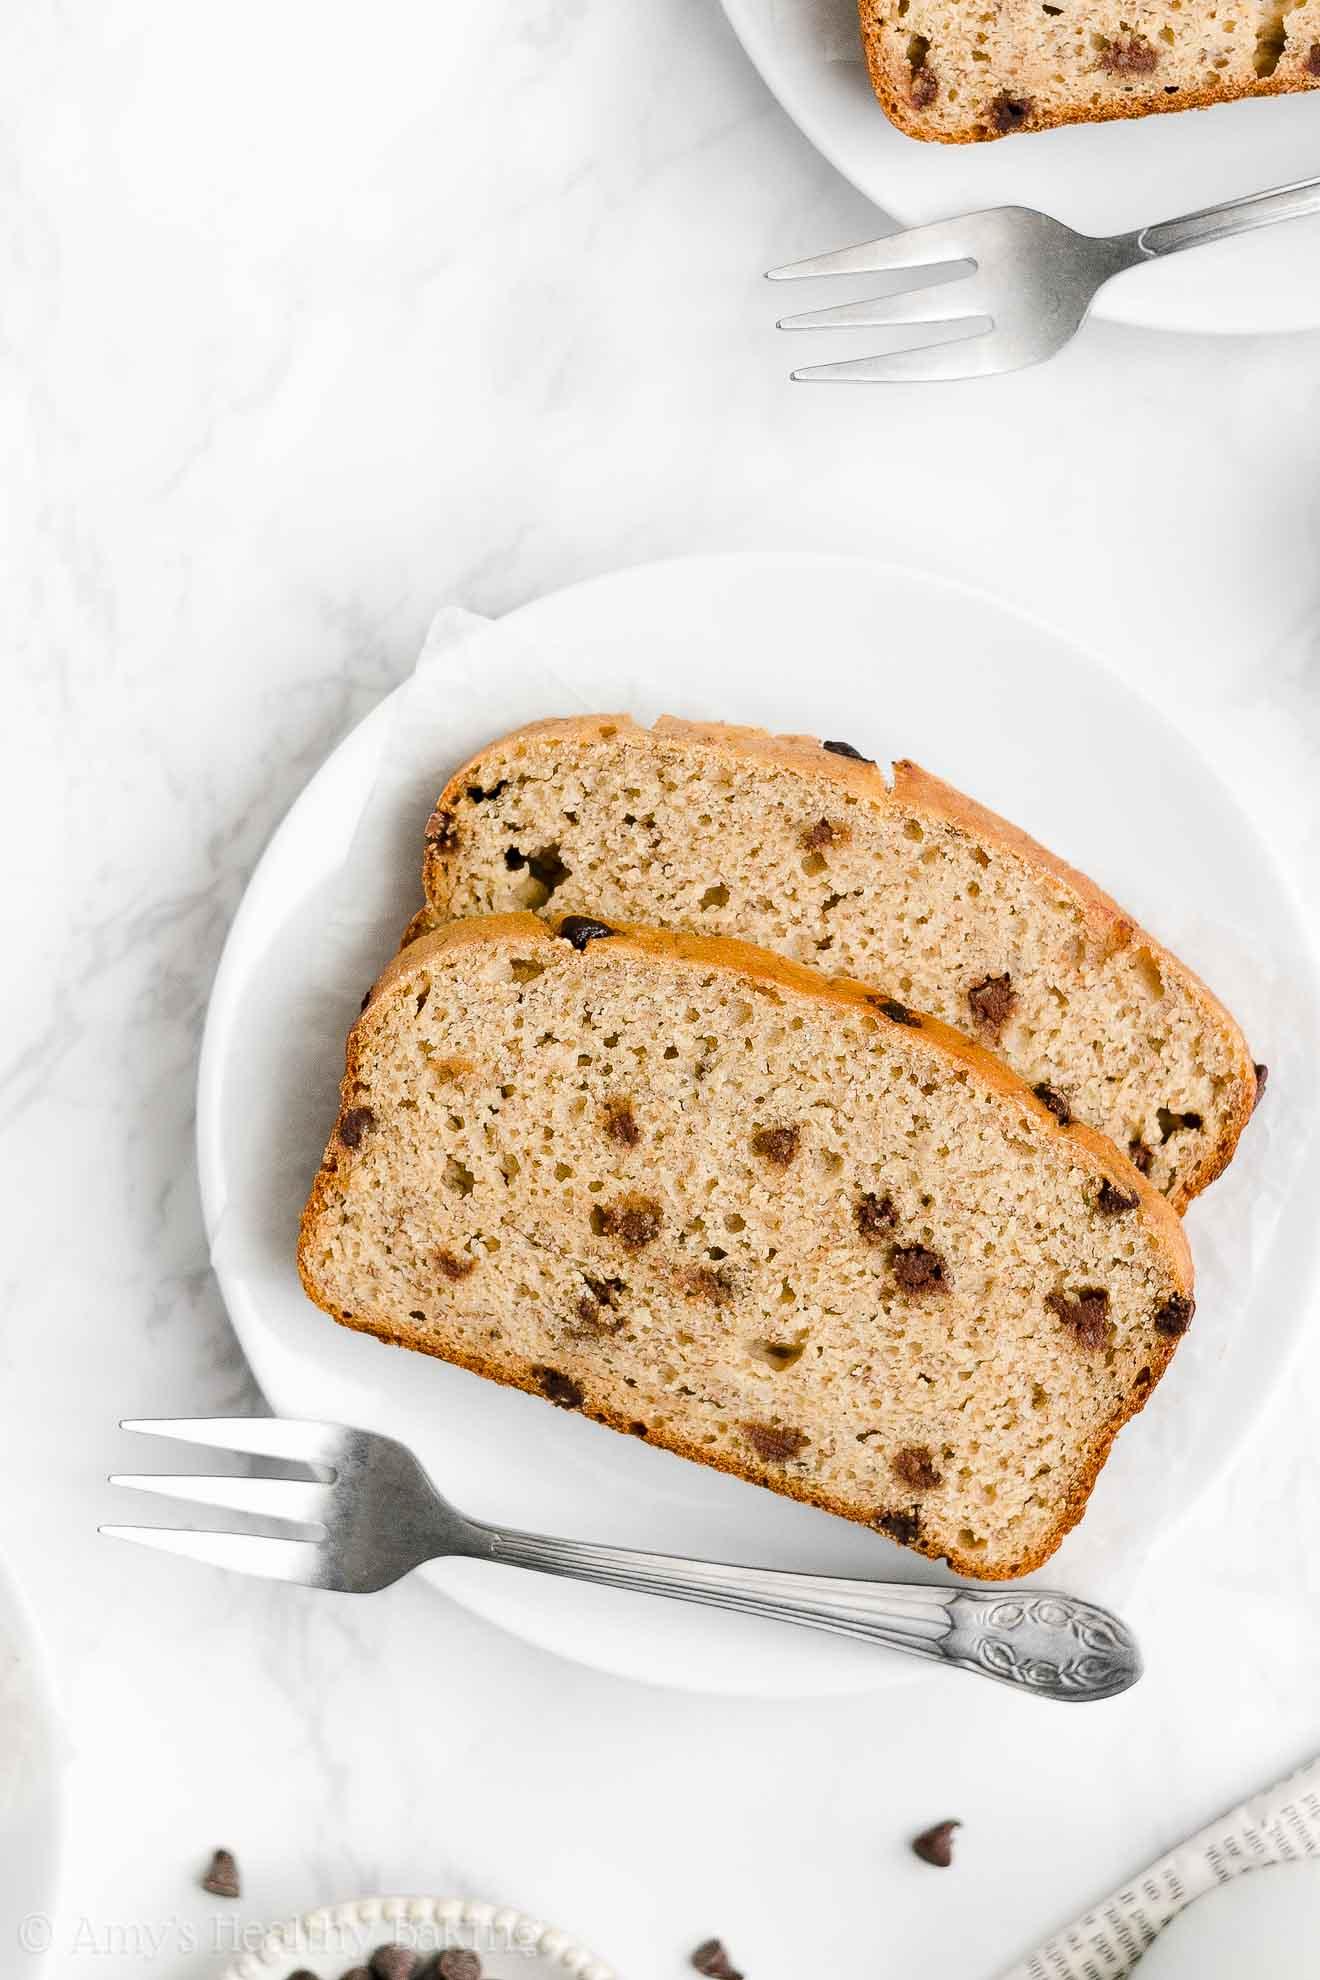 Best Ever Easy Healthy Gluten Free No Sugar Moist Chocolate Chip Banana Bread